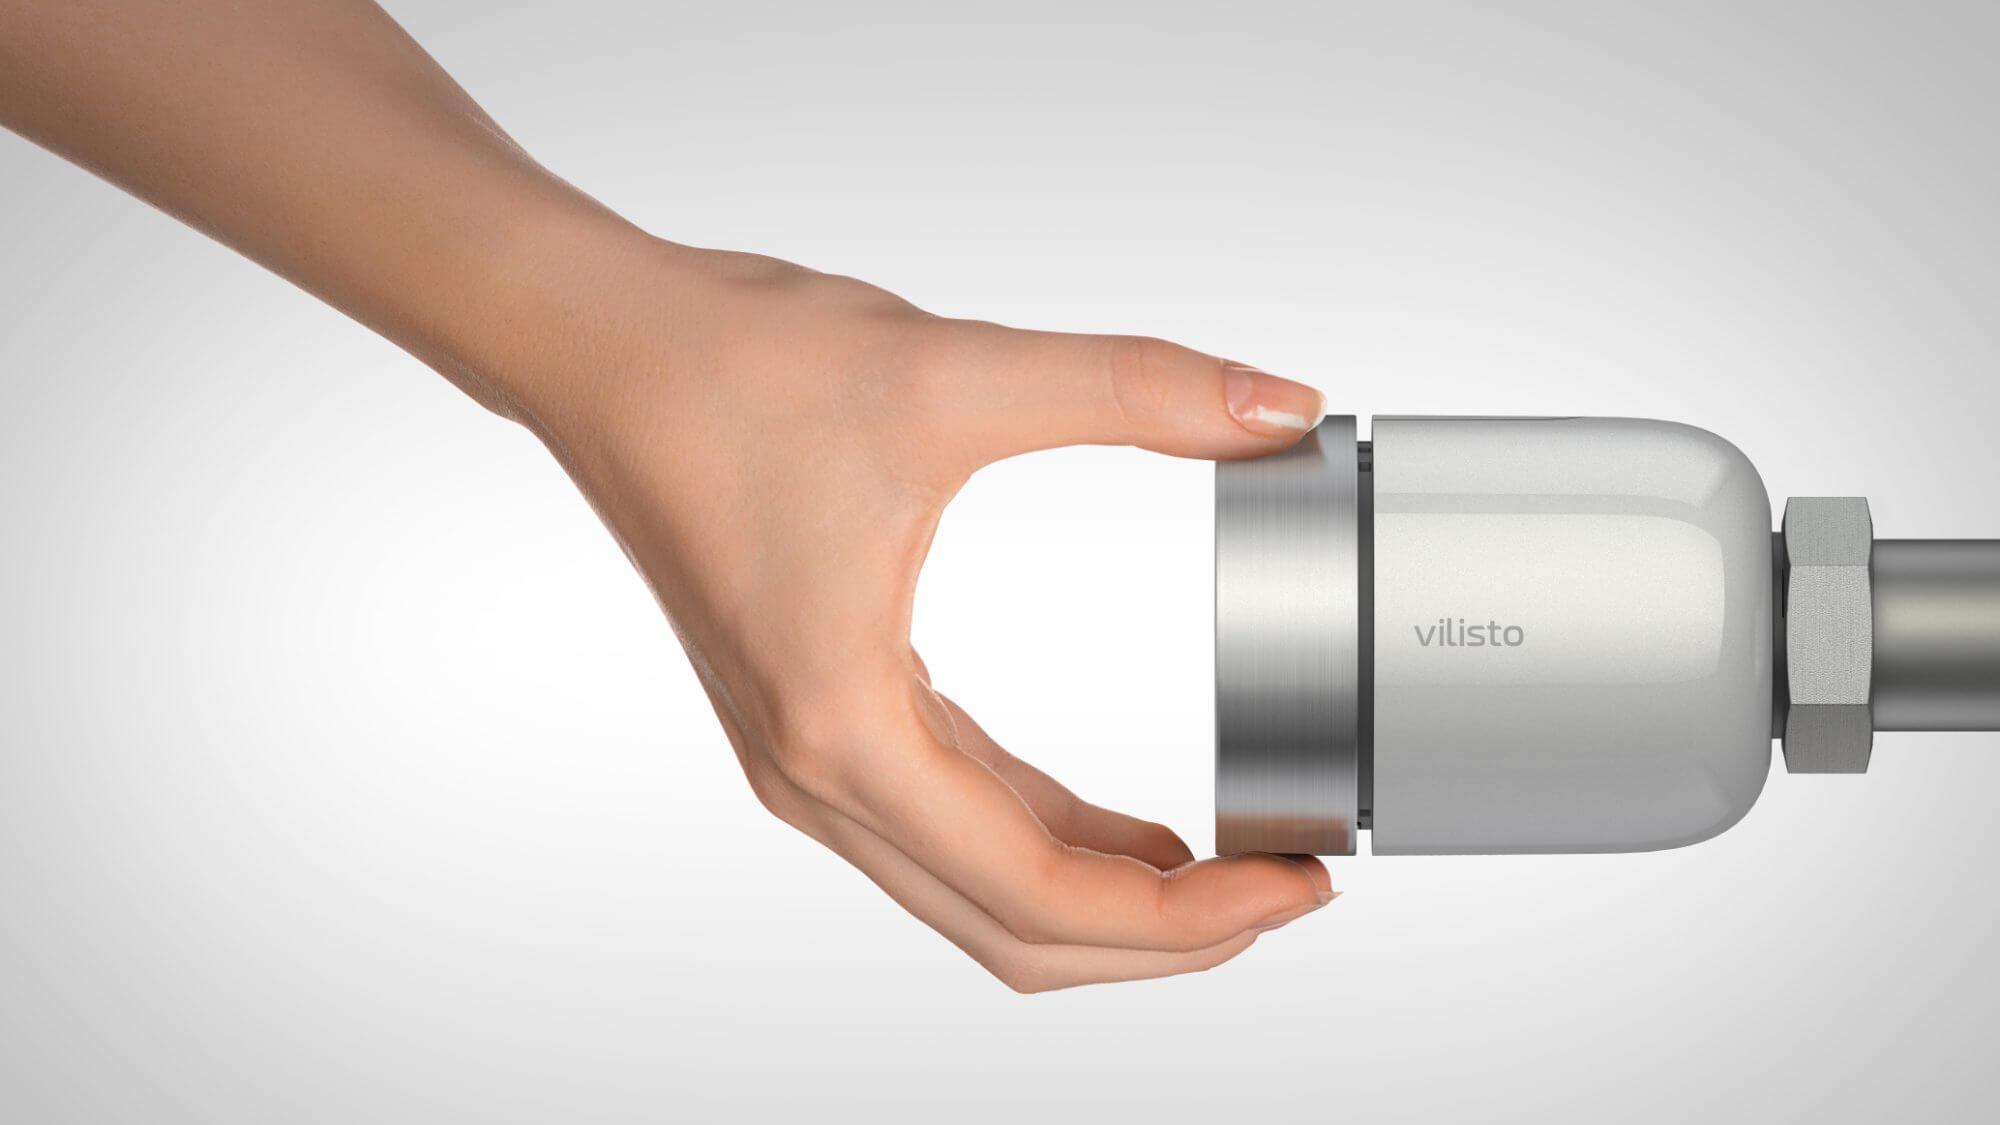 Vilisto Smart Home Thermostat Start-up Use Case Hamburg Innovation